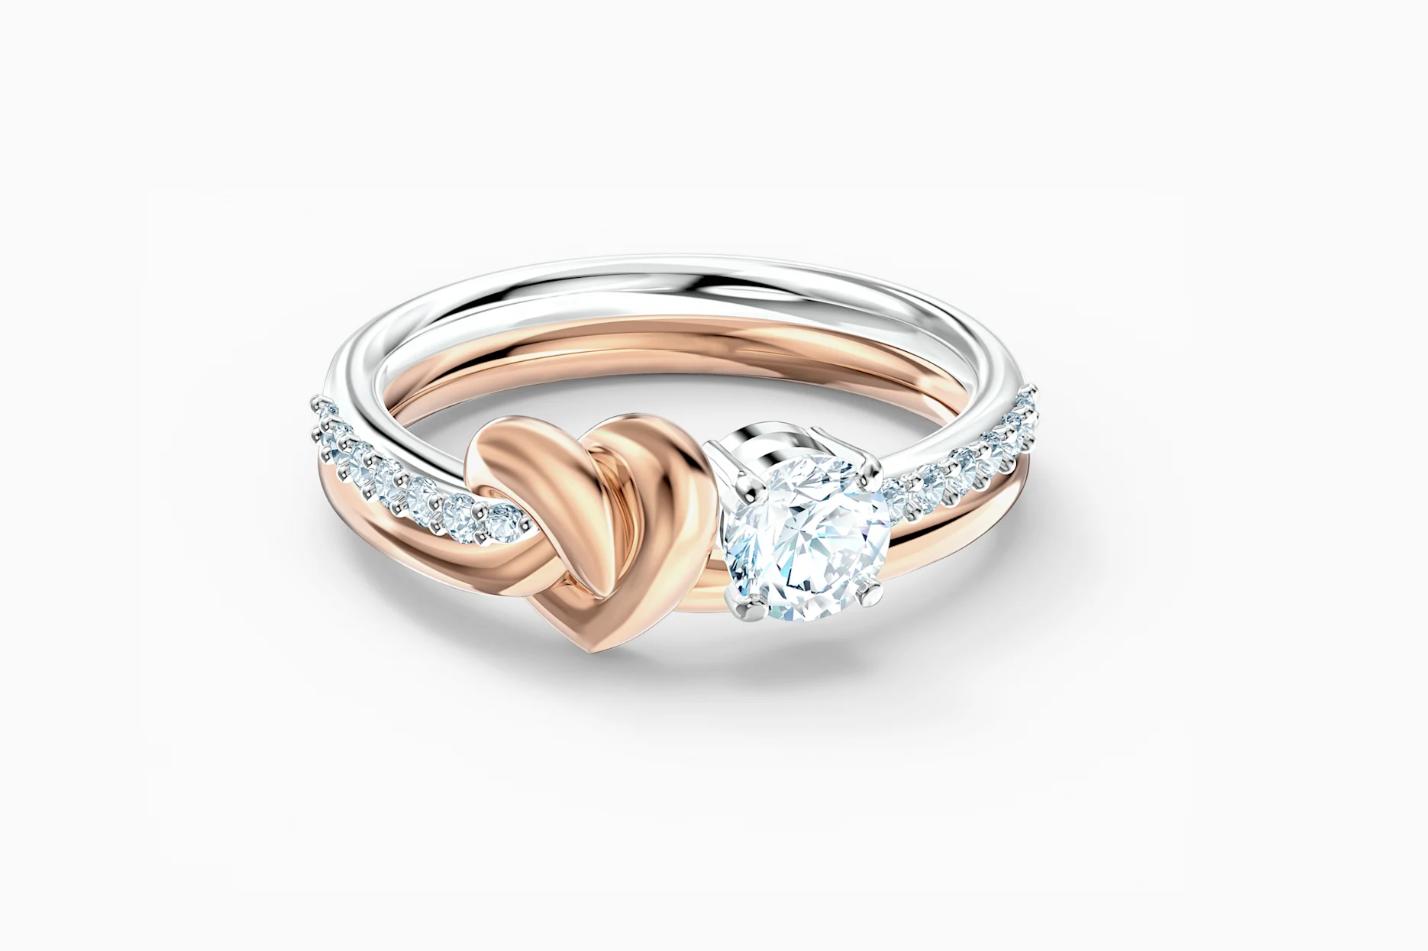 San Valentín joyería romántica anillo